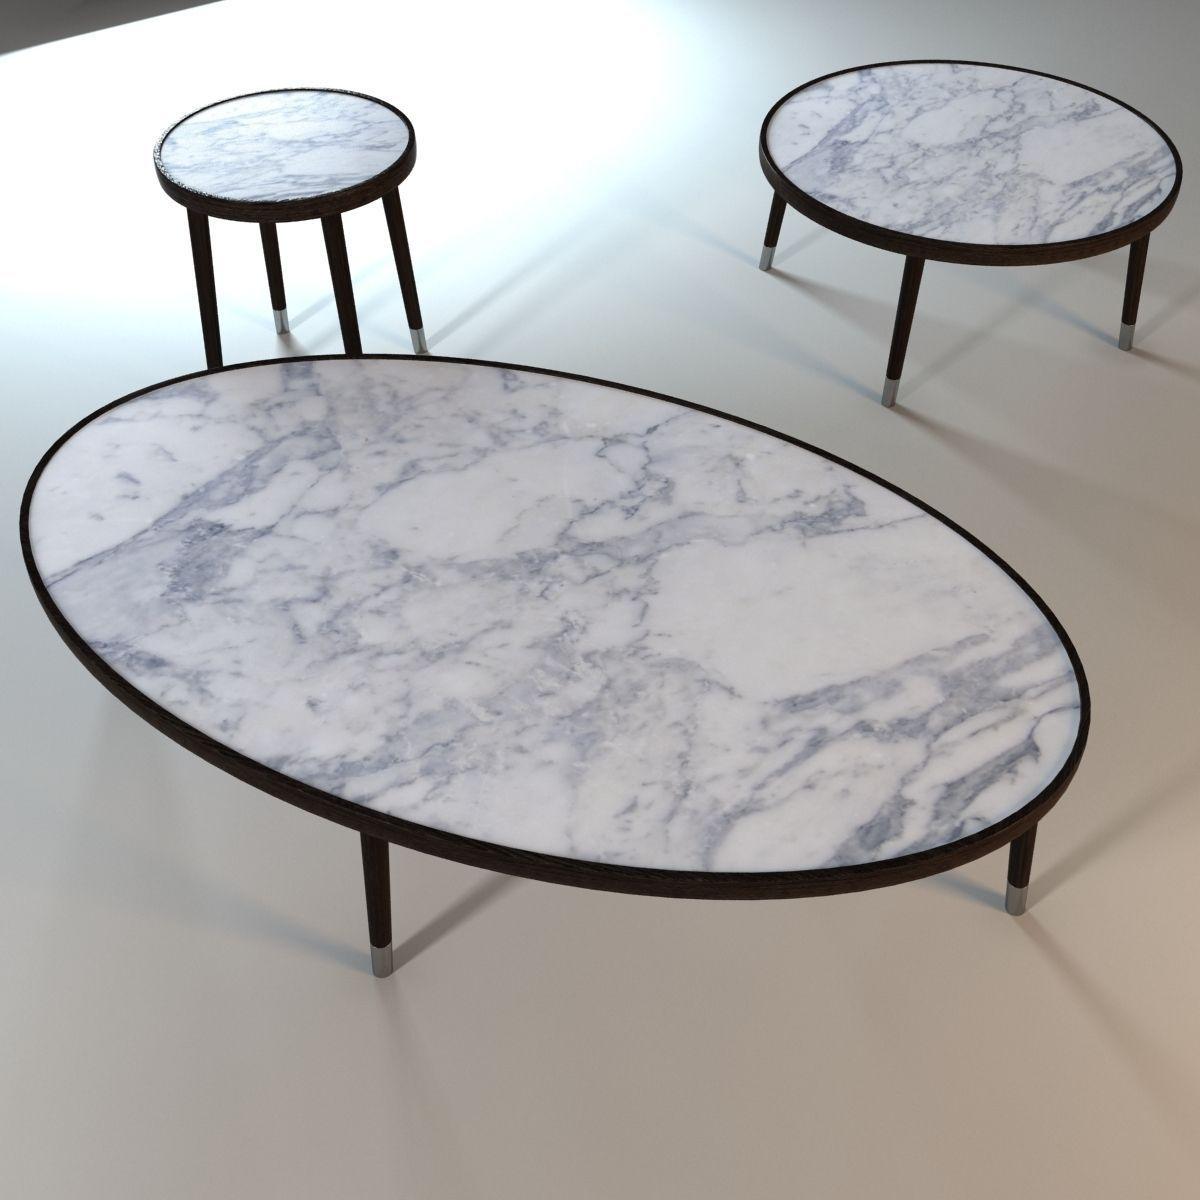 Bigne porada coffee table 3d model max obj 3ds fbx for Coffee table 3d model